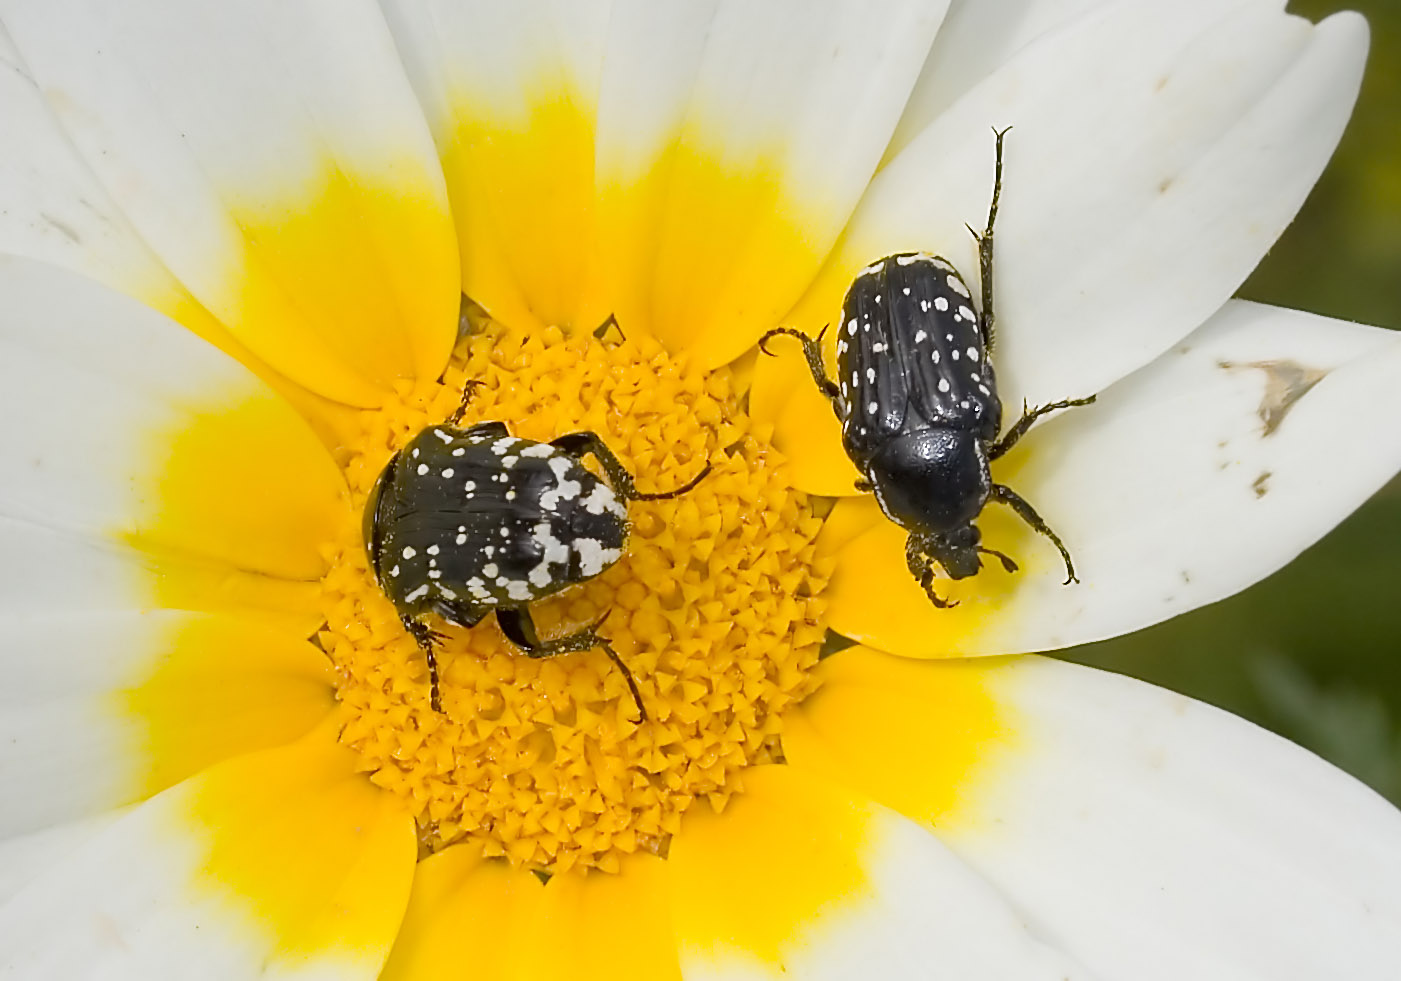 Oxythyrea cinctella - Fam. Cetoniidae  -   Amorgos - Scarabaeidea - Blatthornkäfer - scarab beetles